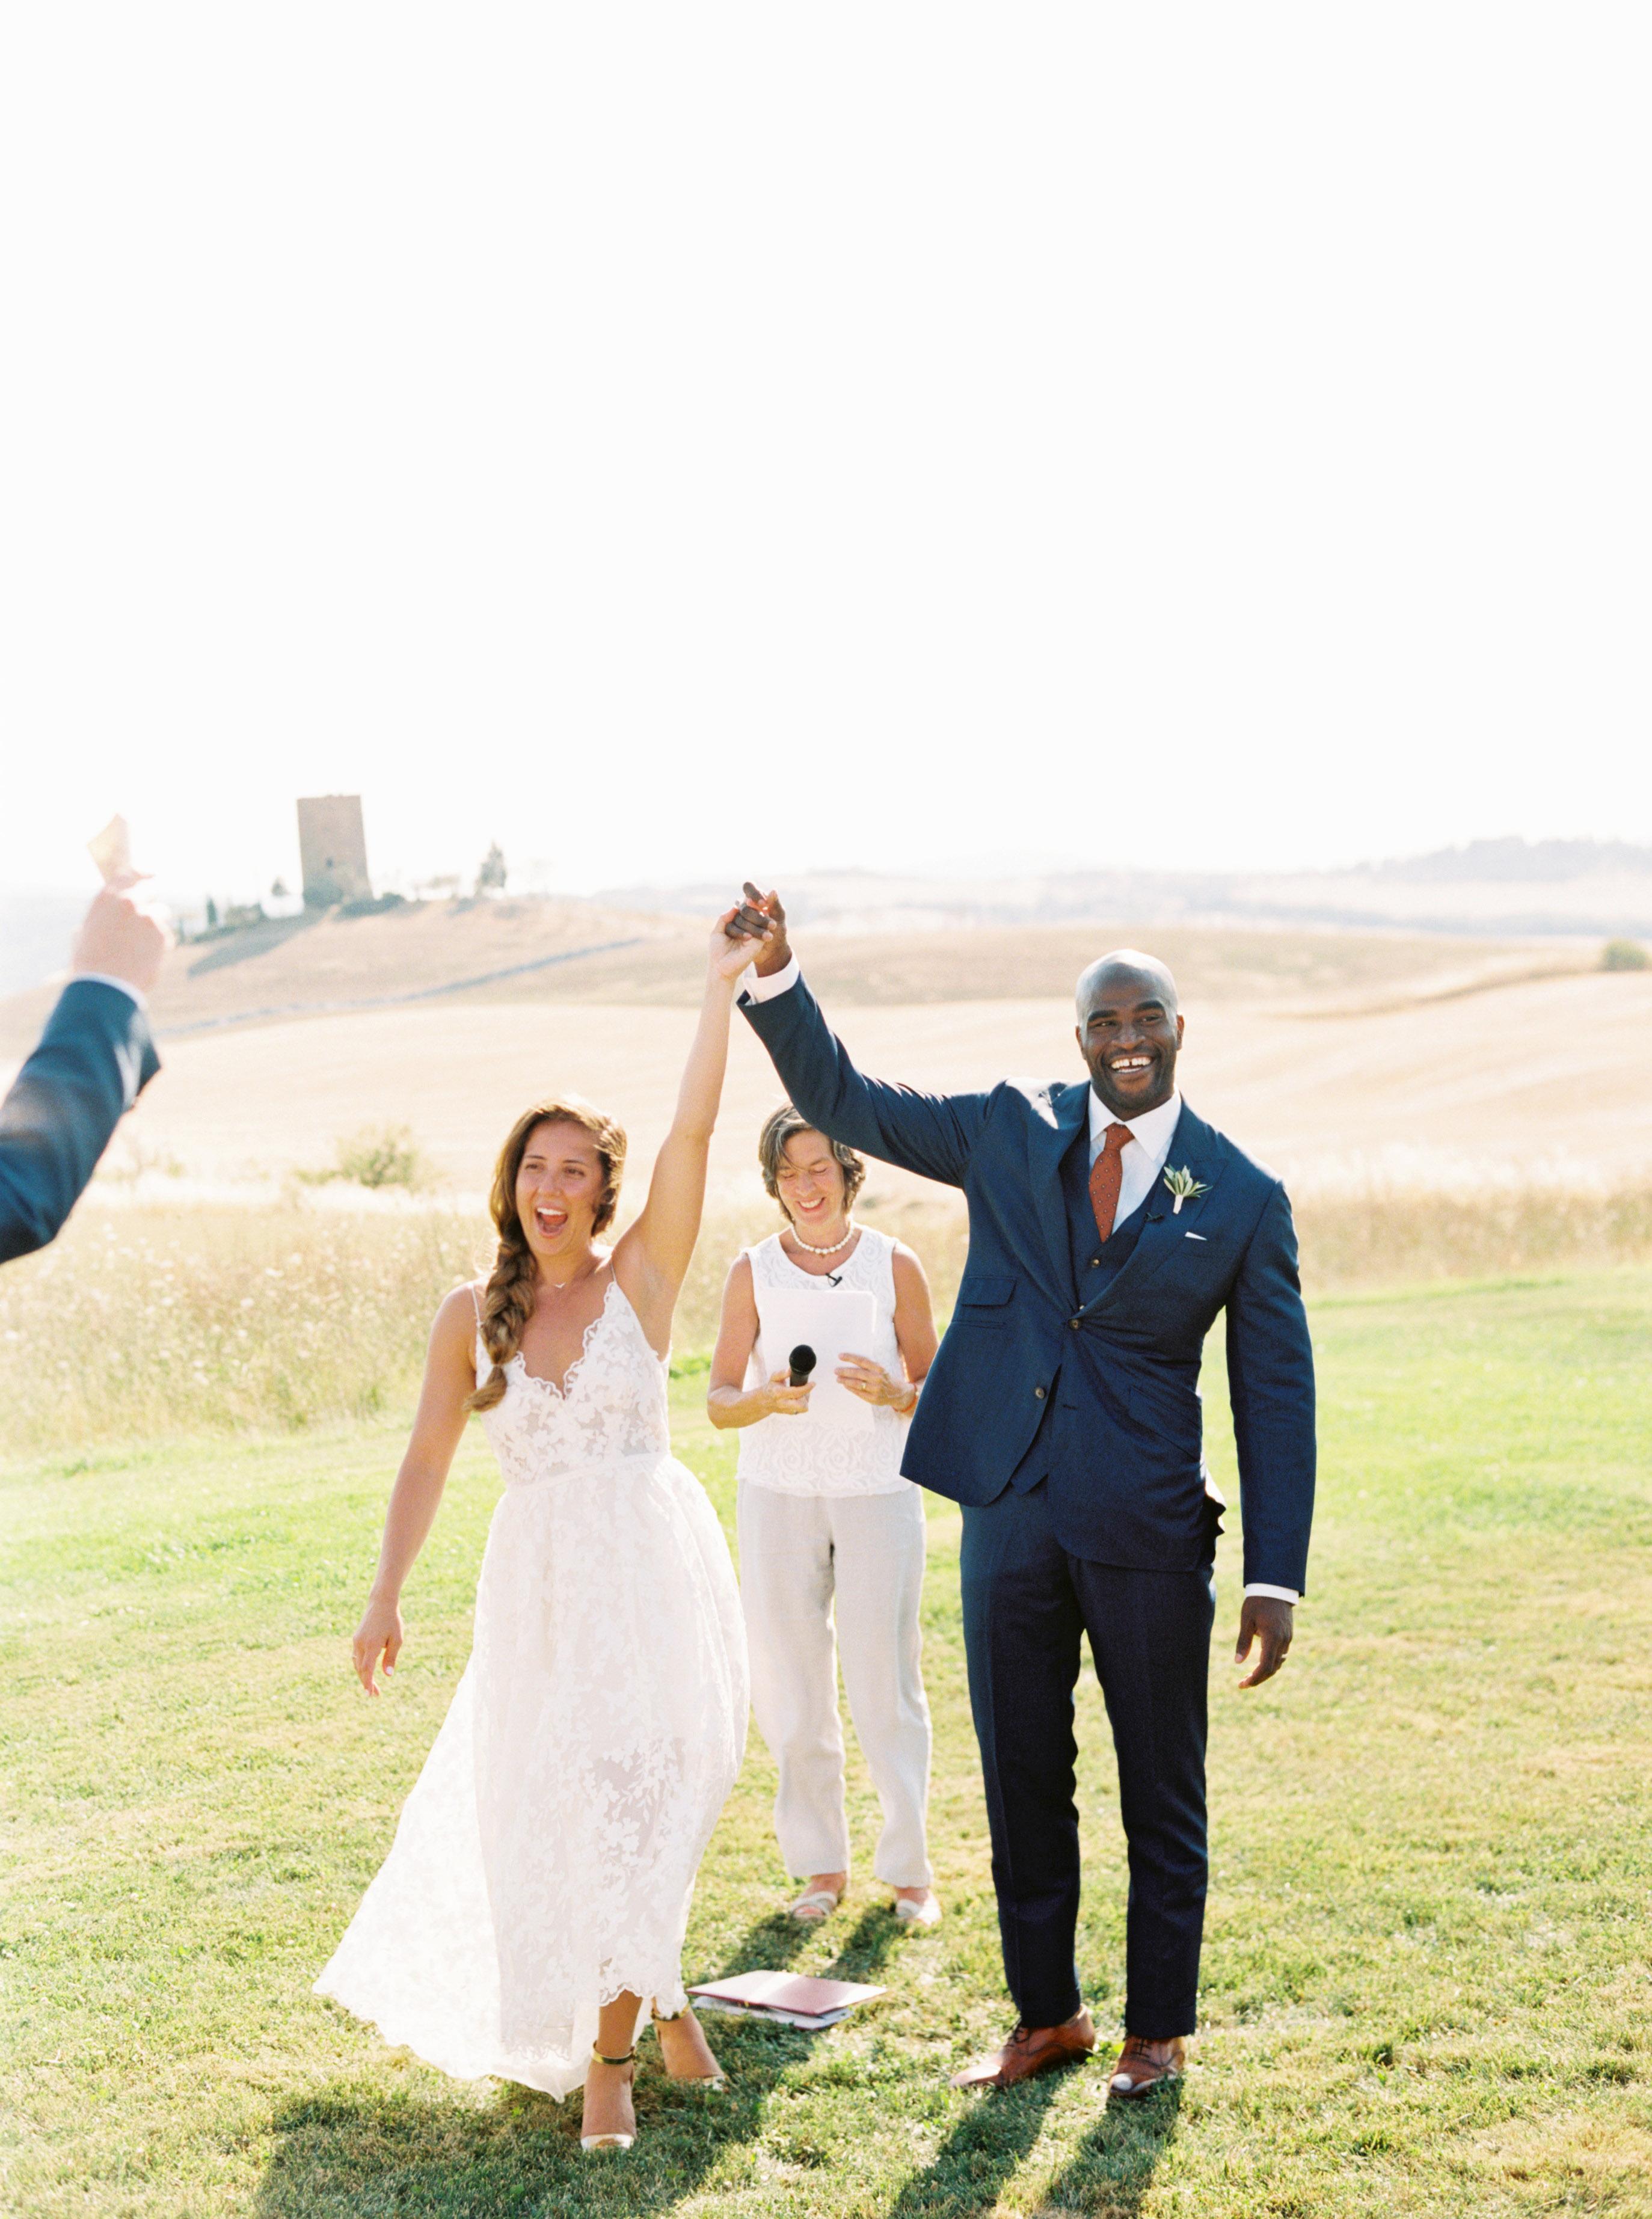 leila joel wedding ceremony just married